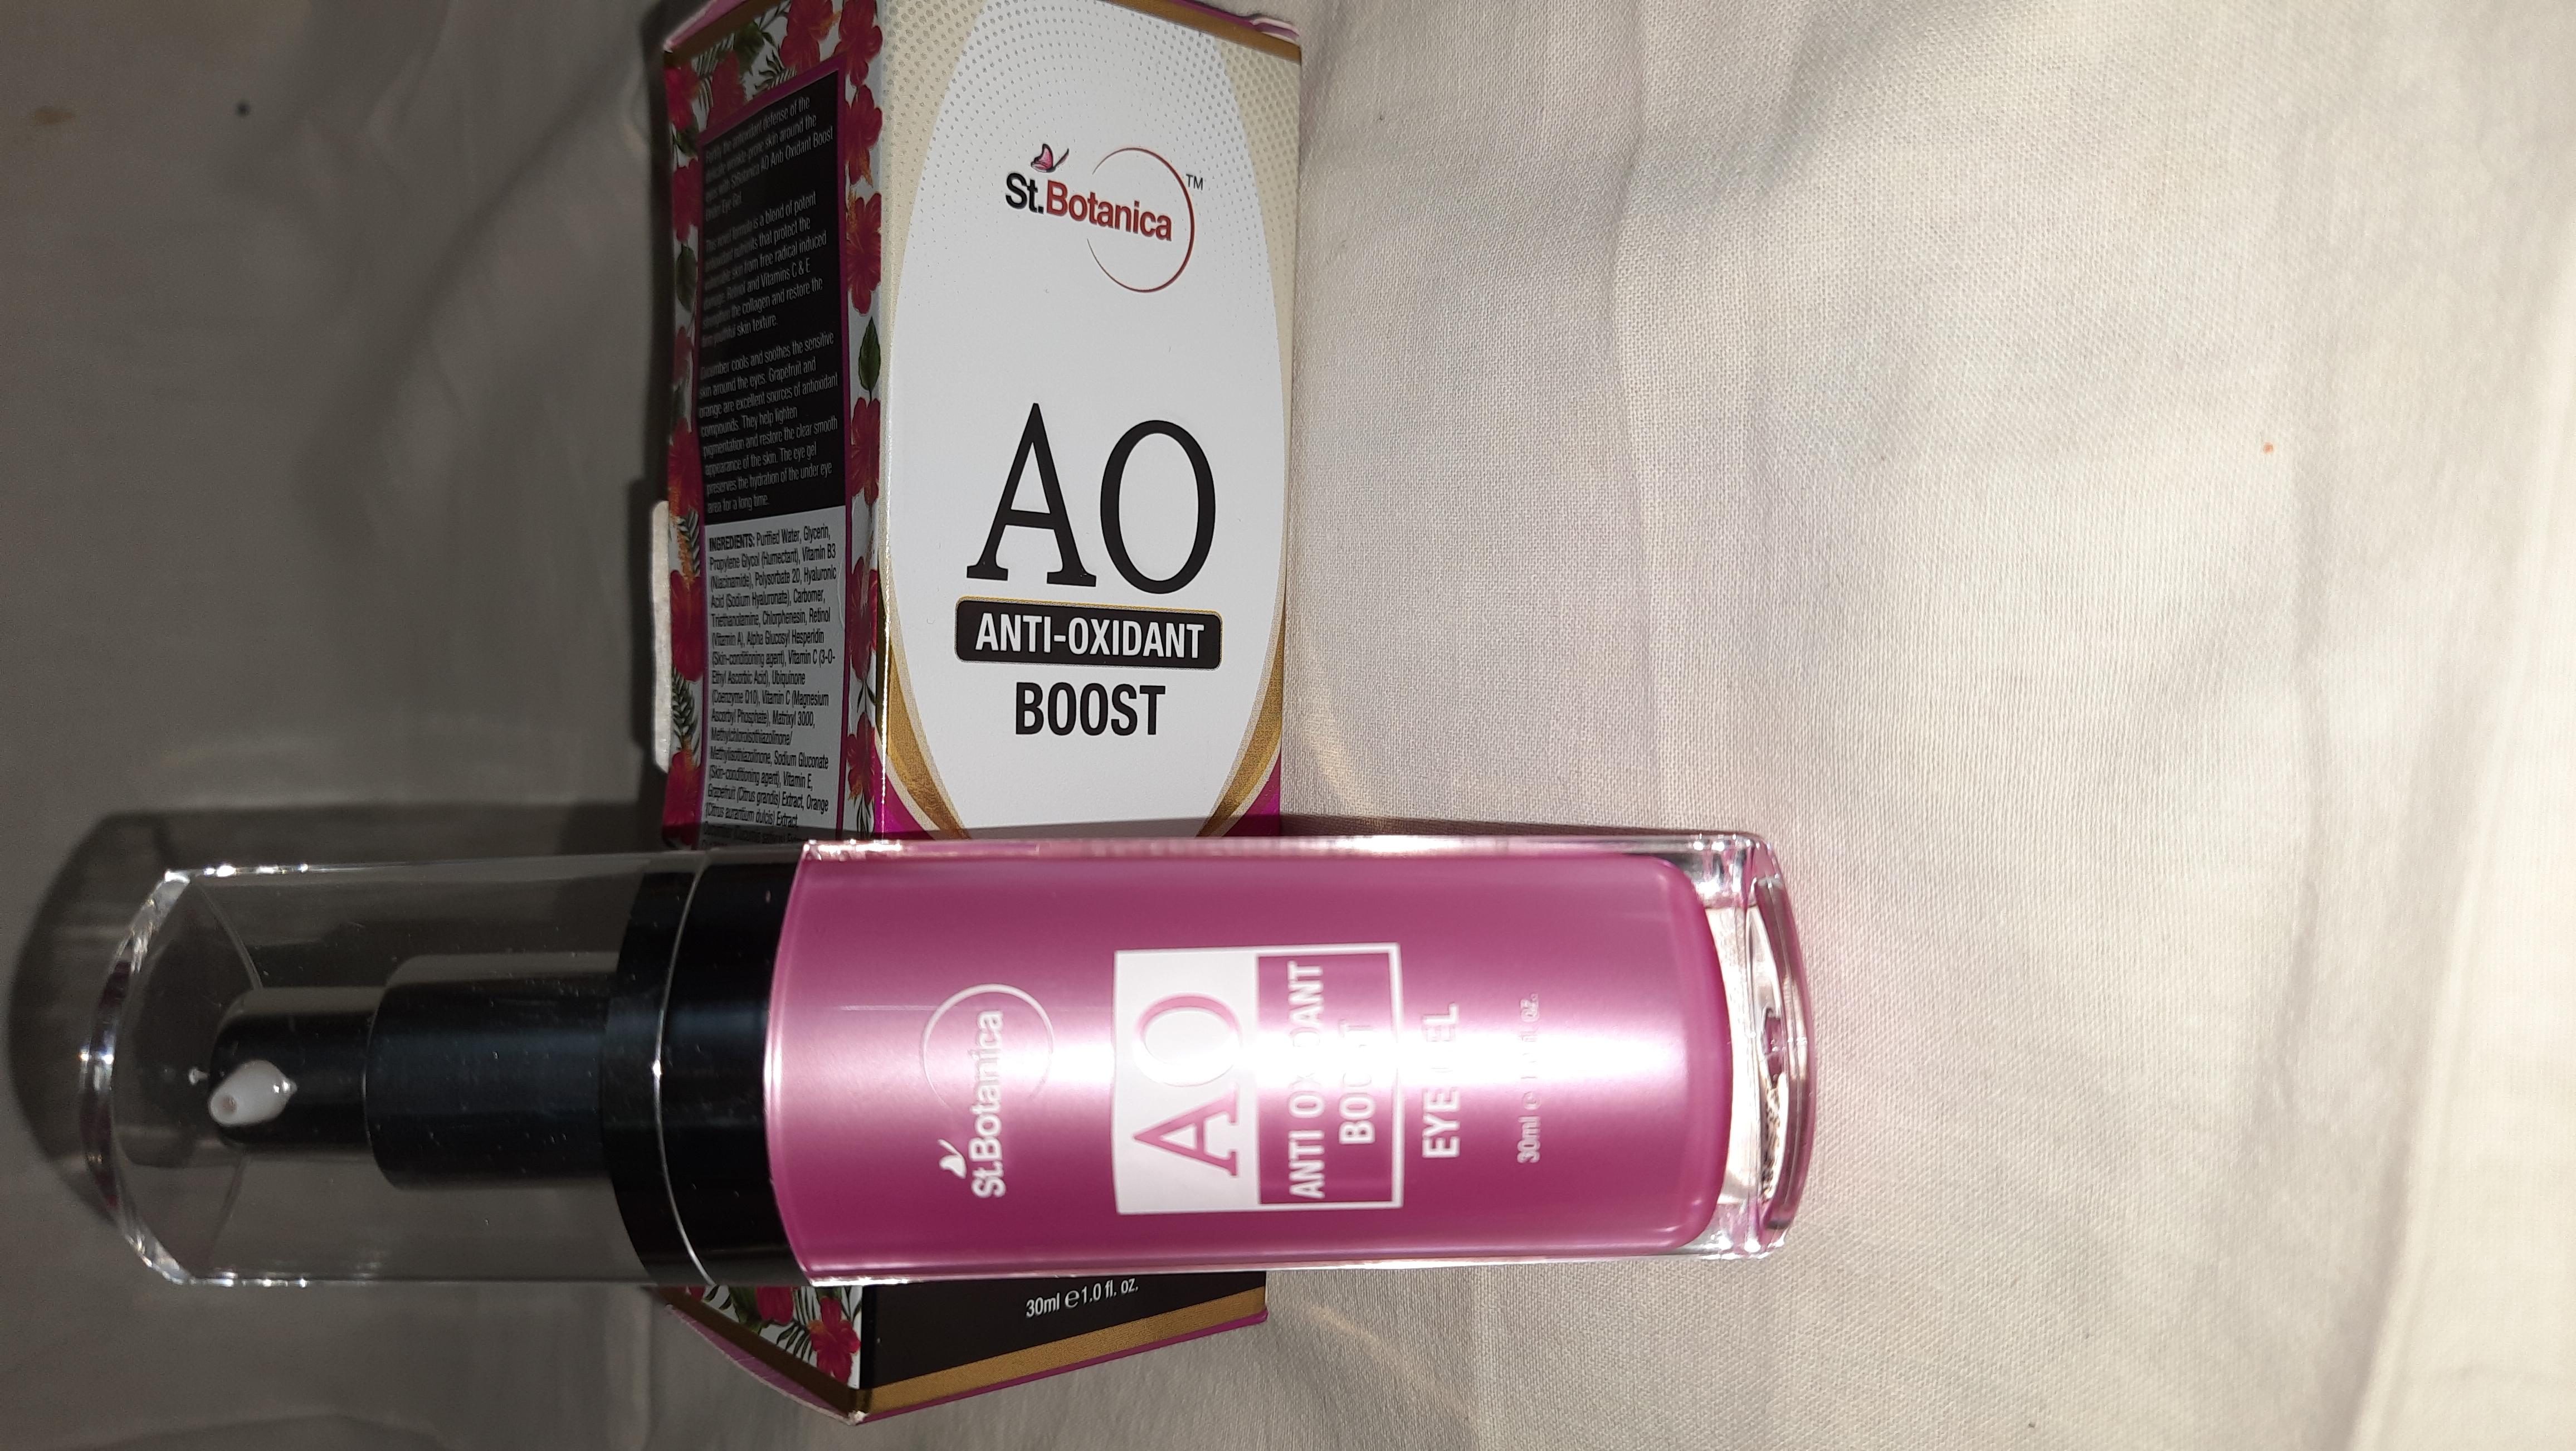 St.Botanica Anti Oxidant Boost Under Eye Gel-Product is good-By anupama_roy-6